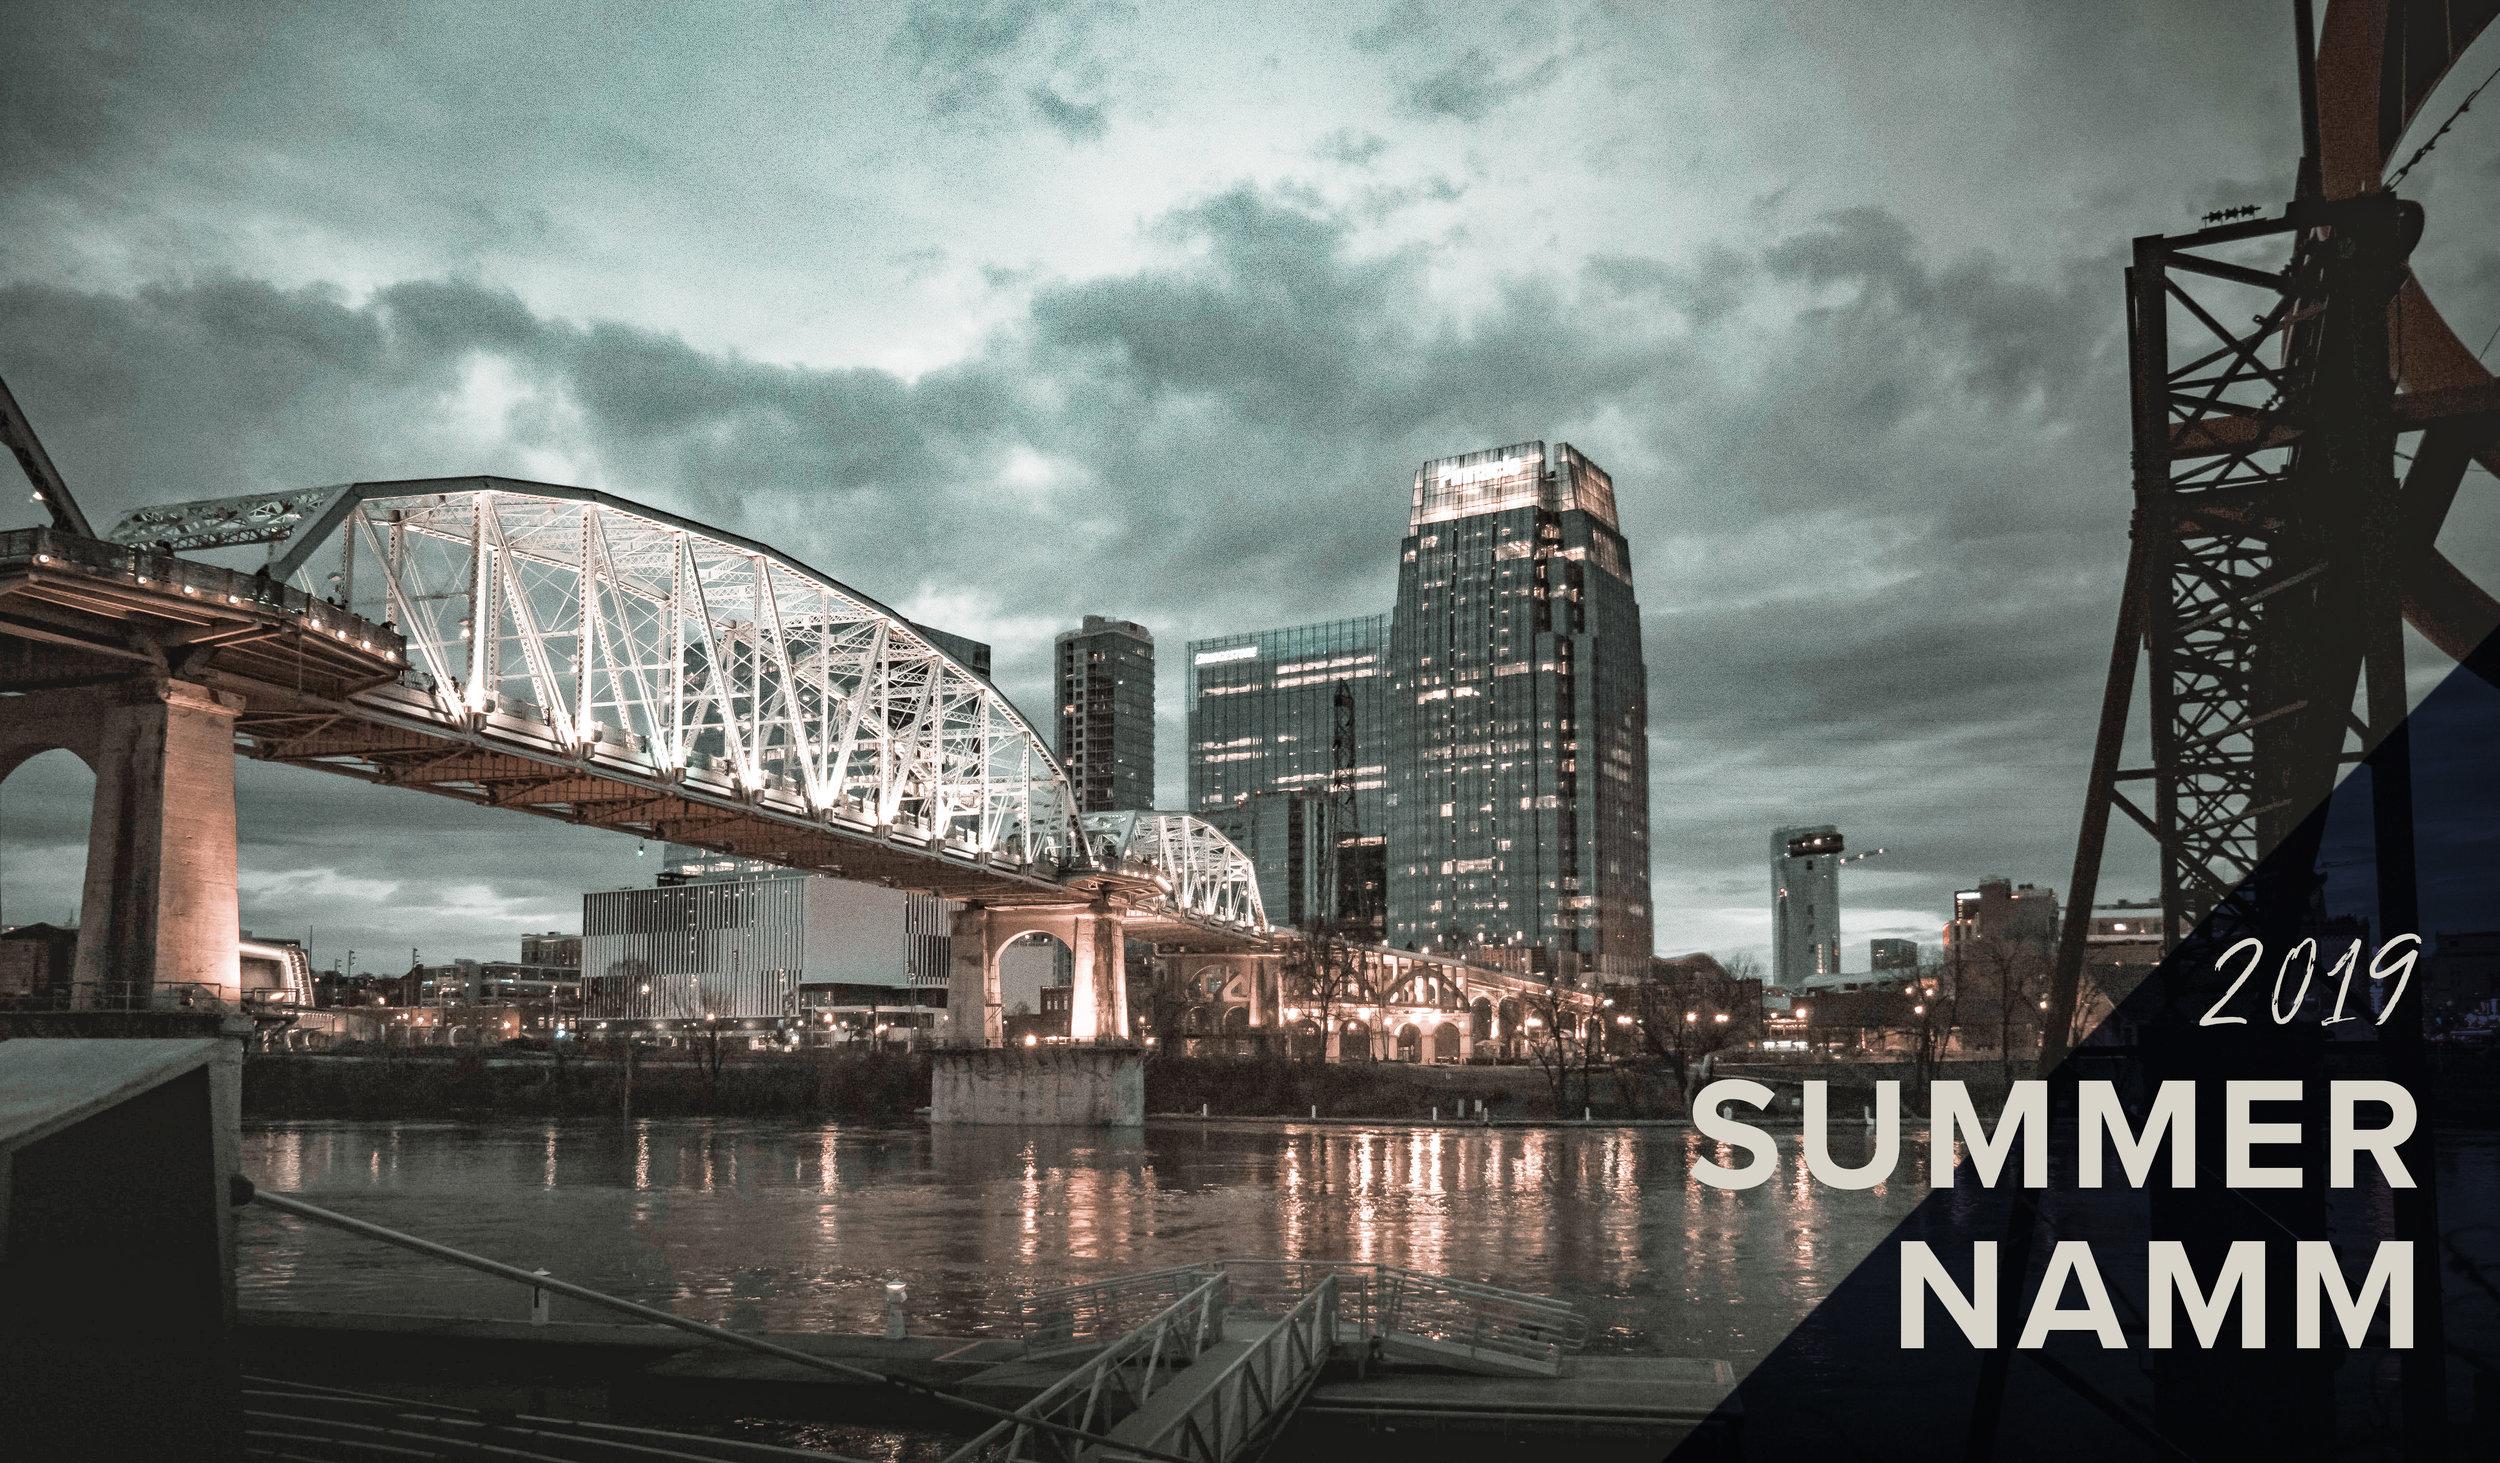 2019 Summer Namm.jpg